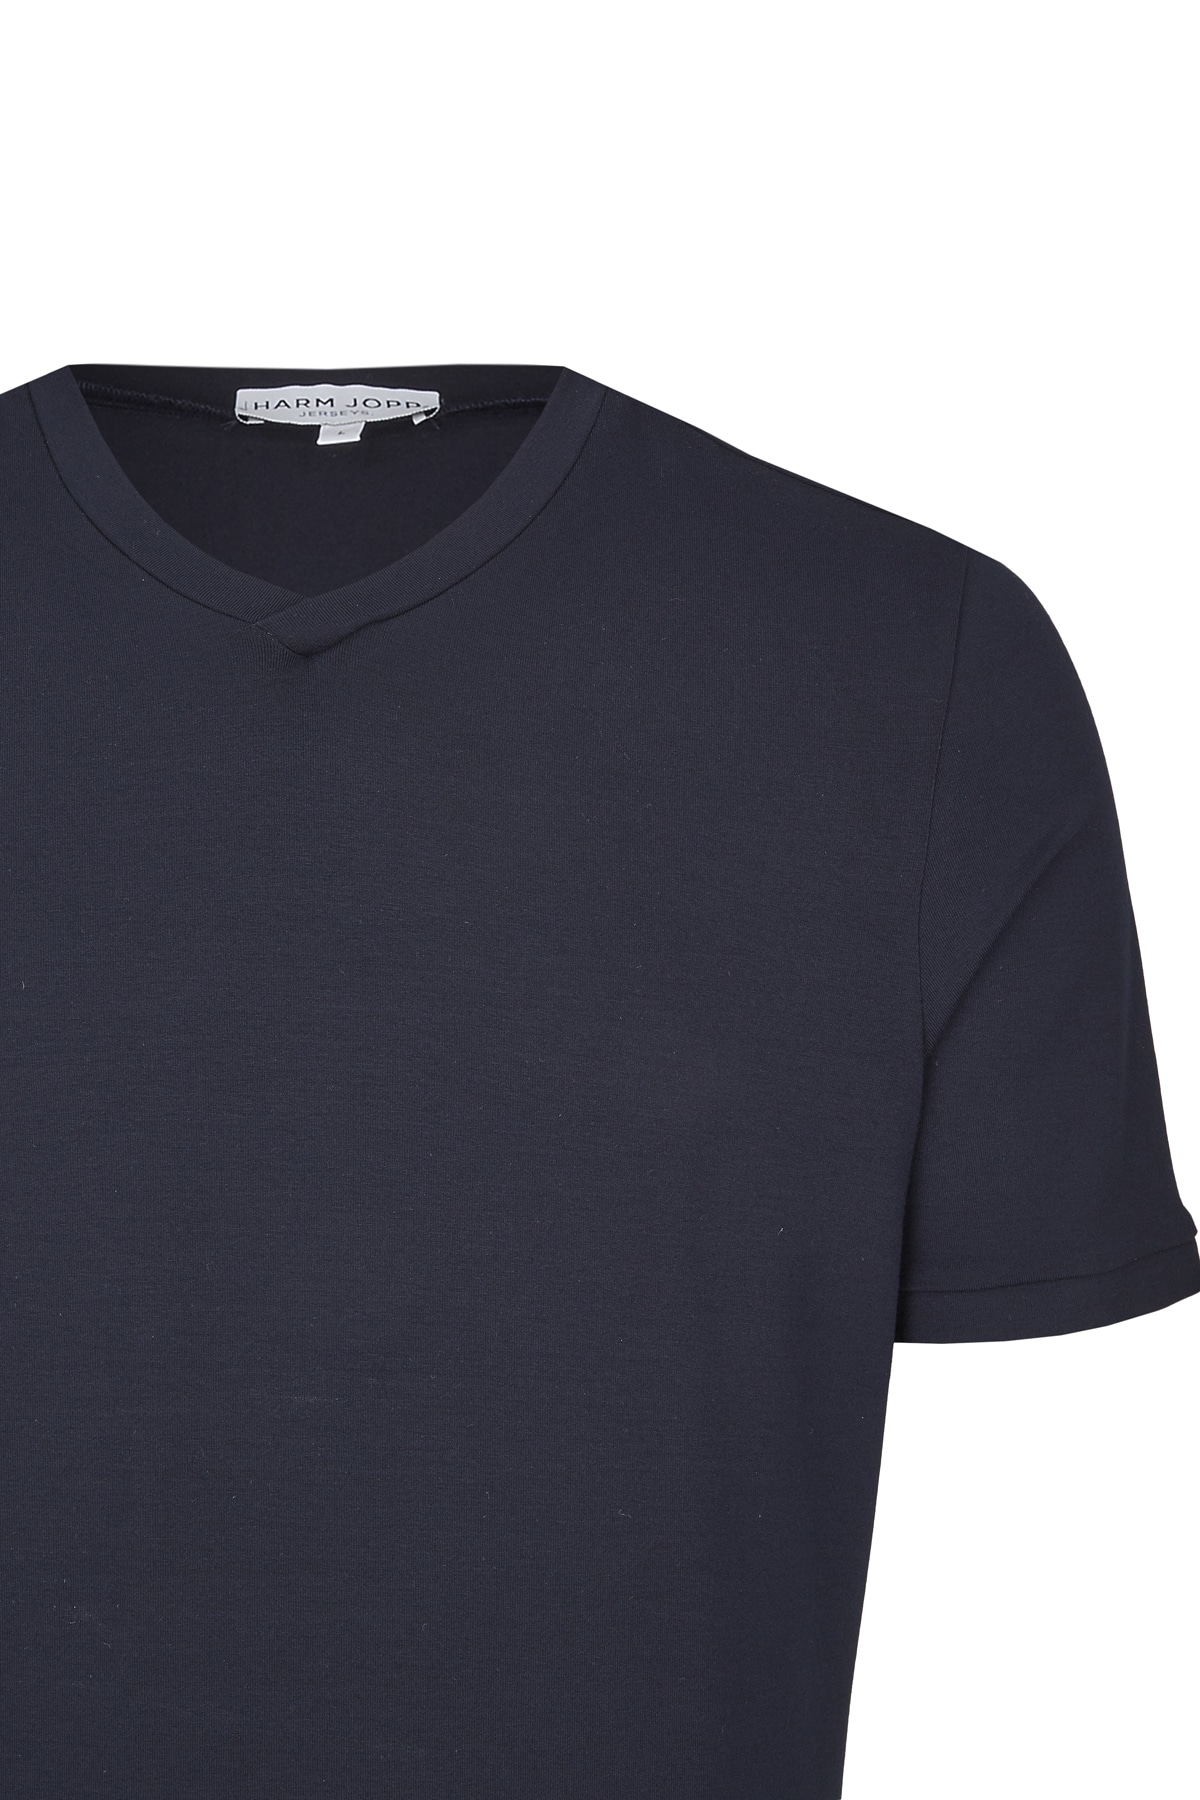 T-shirt_dunkelblau_3